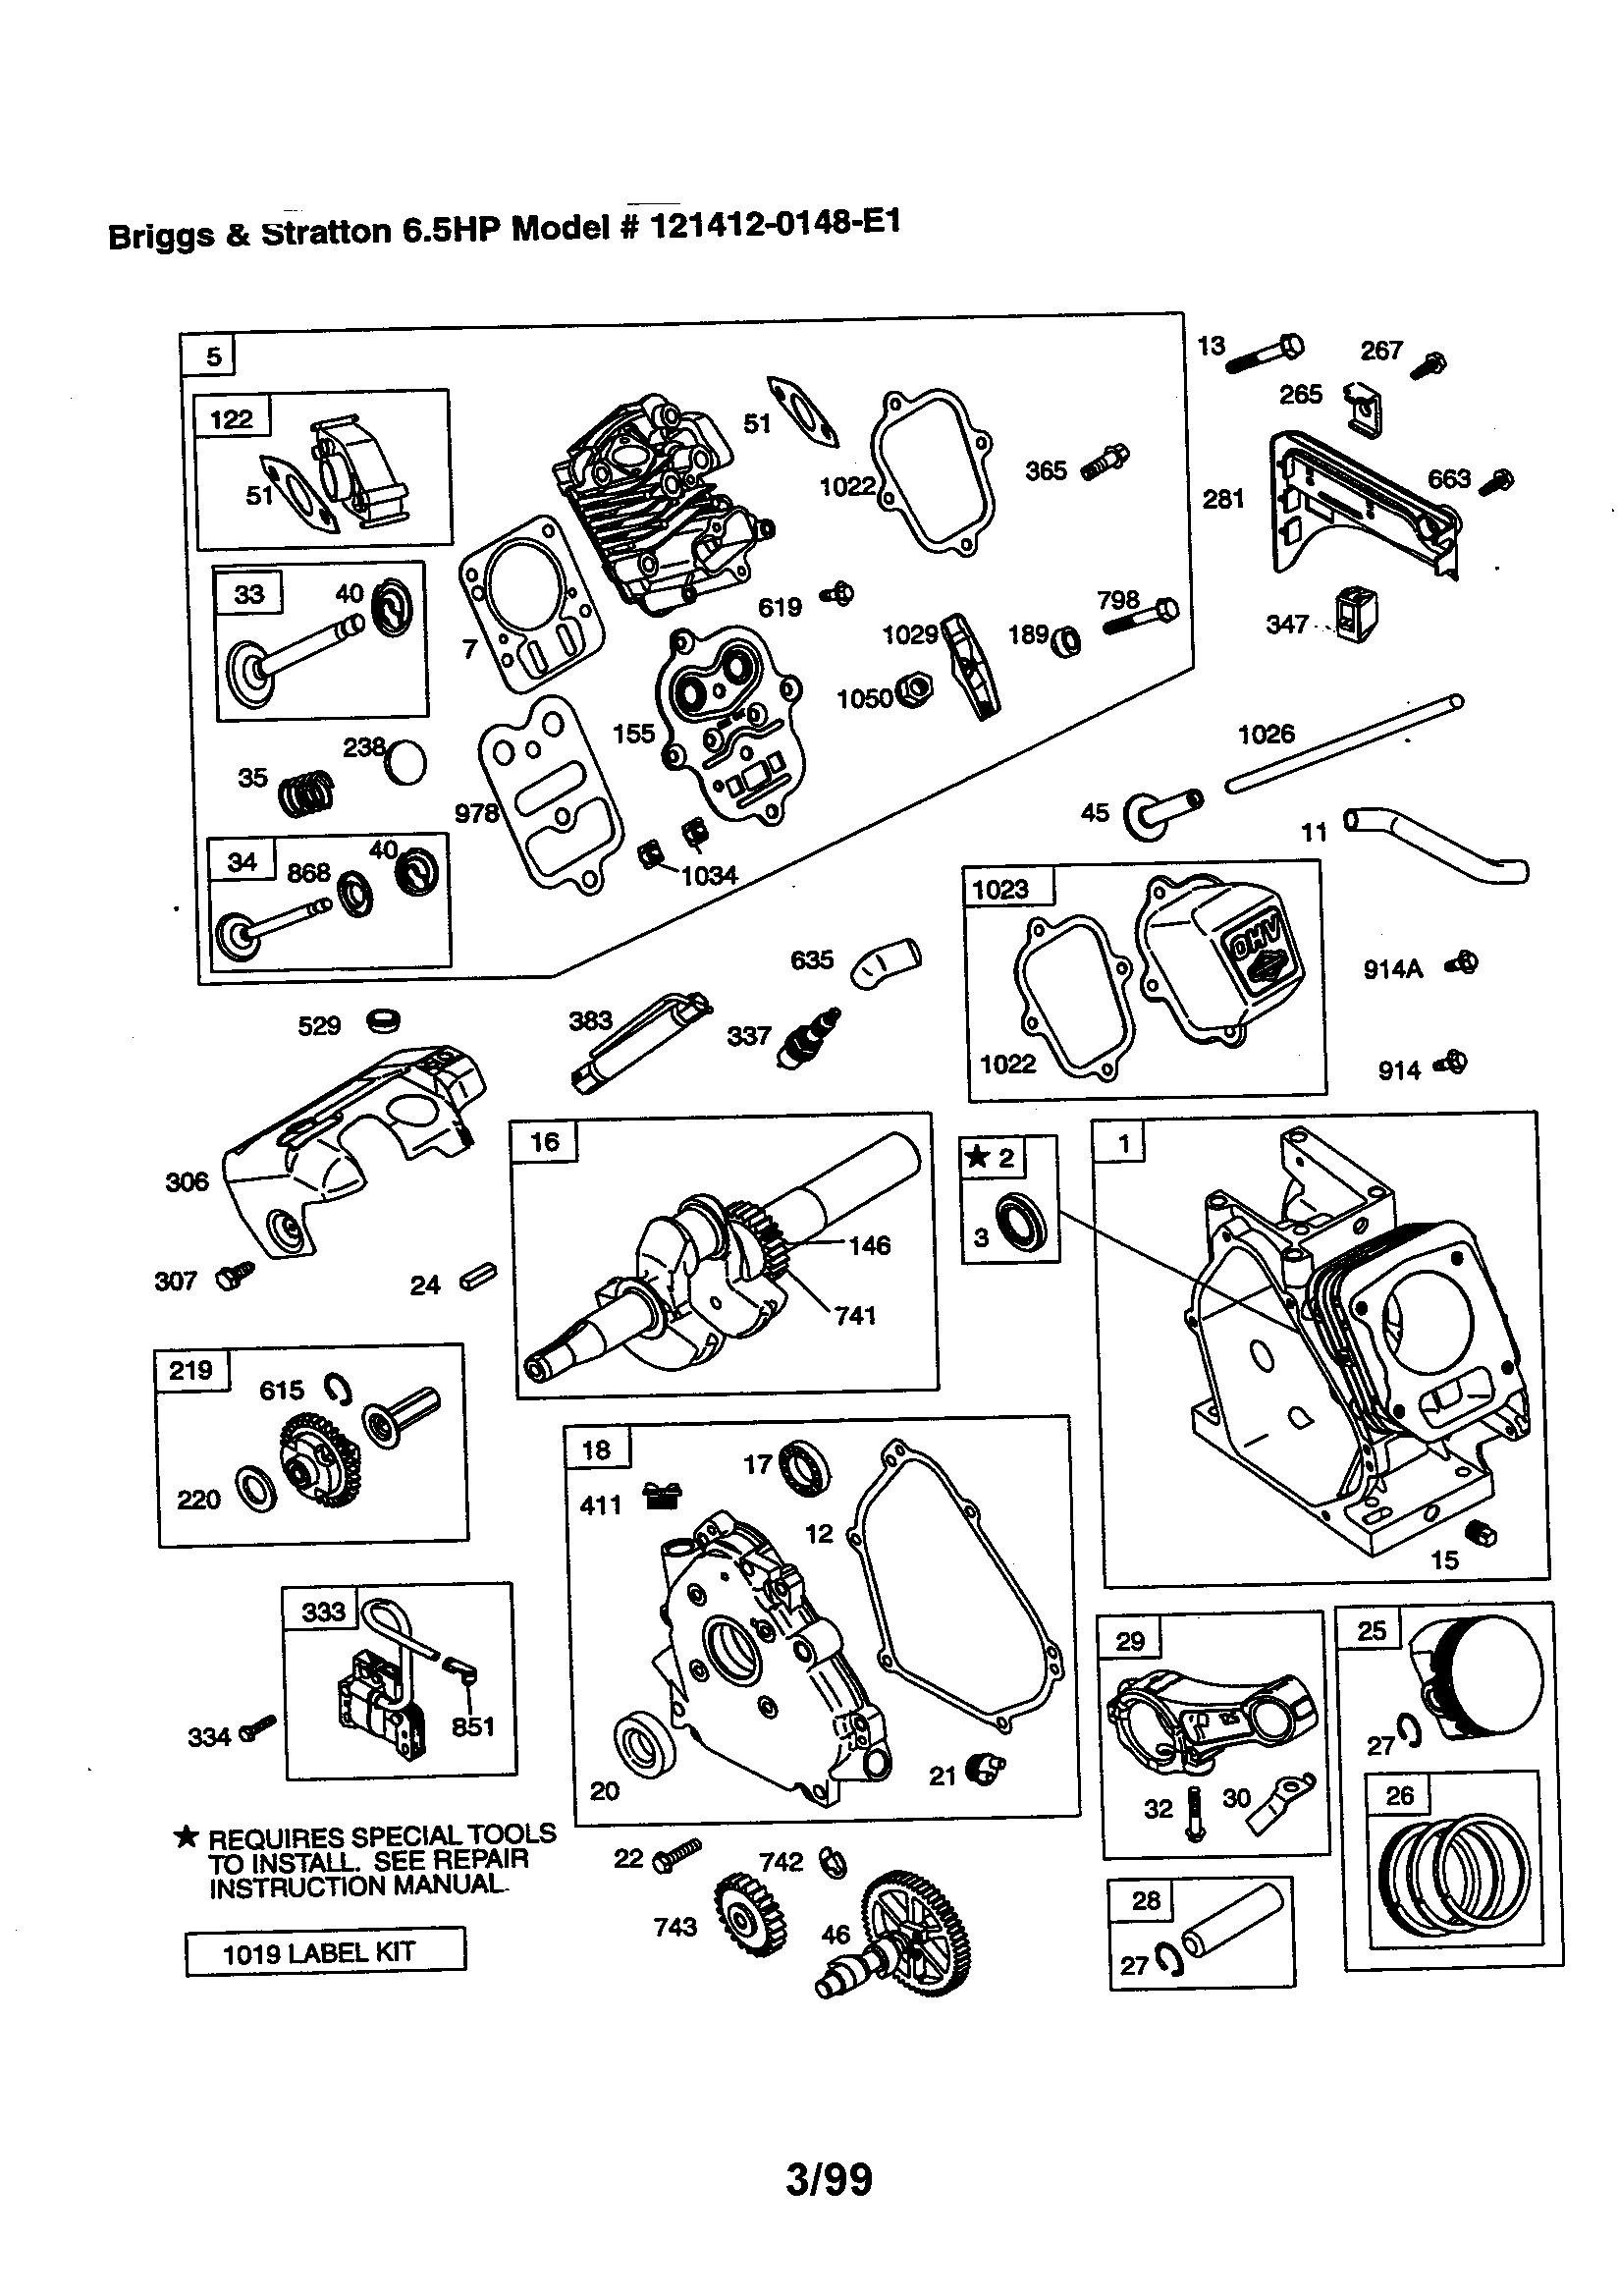 Briggs and Stratton 6 5 Hp Engine Diagram 2 Briggs and Stratton Wiring Diagram 5 Hp New Stunning 20 Chromatex Of Briggs and Stratton 6 5 Hp Engine Diagram 2